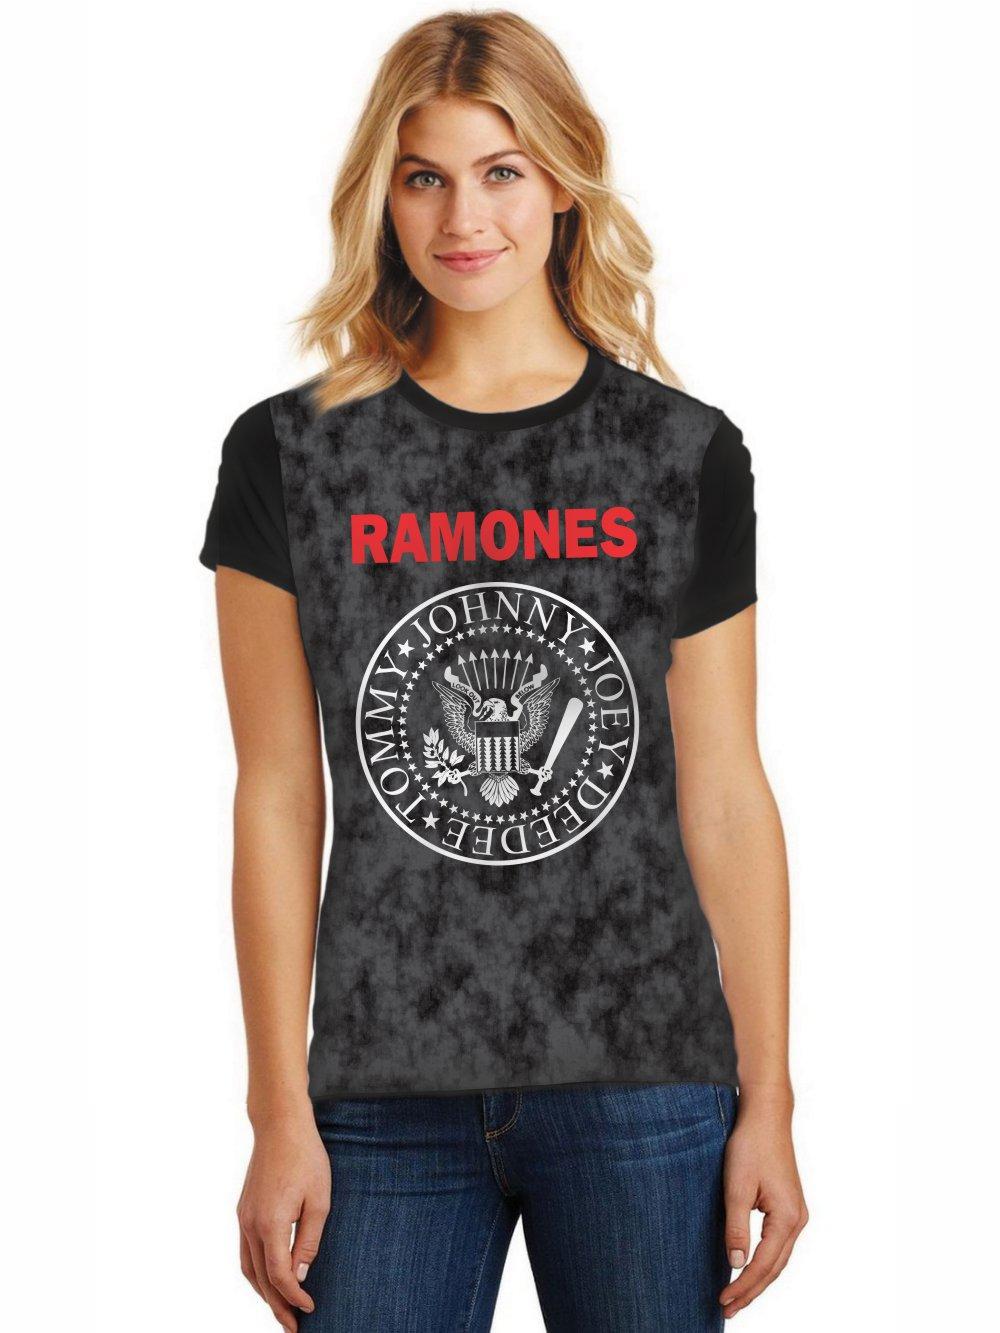 Camiseta Feminina T-Shirt Full Printed Banda Ramones Baby Look FP_007